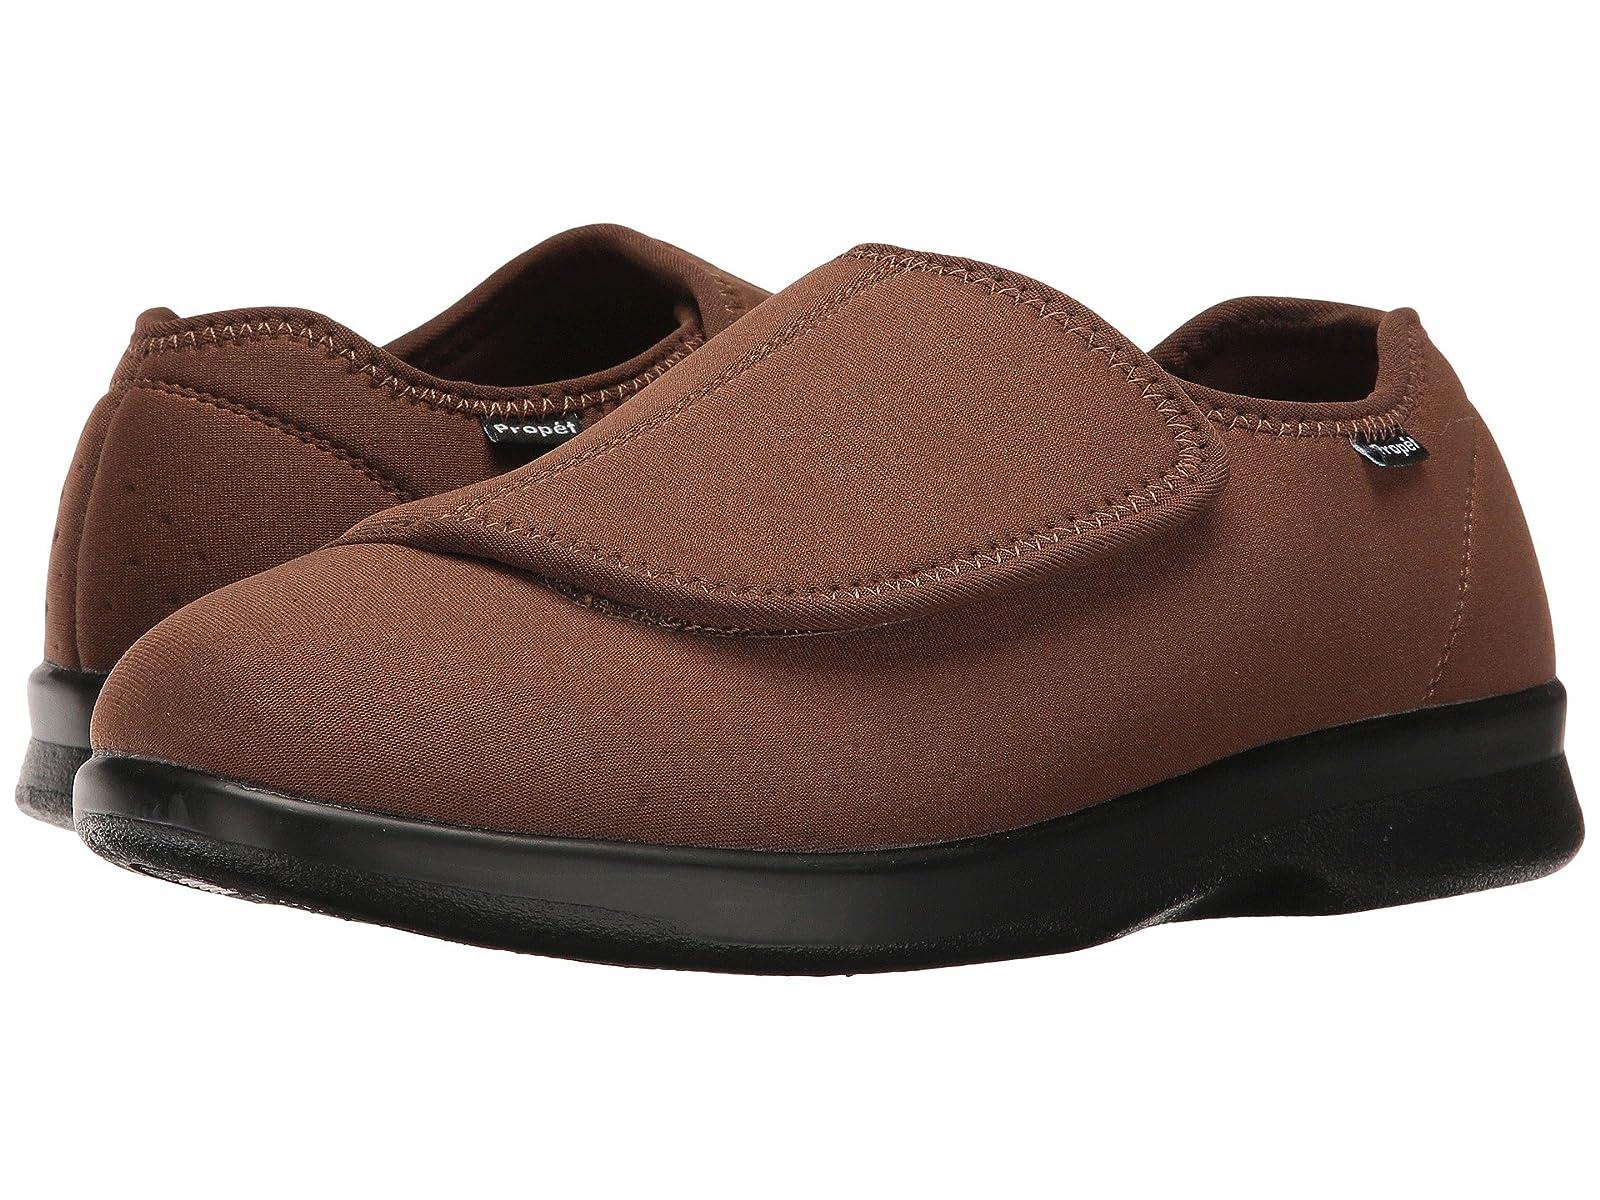 Propet Cush 'n Foot Medicare/HCPCS Code = A5500 Diabetic ShoeAtmospheric grades have affordable shoes